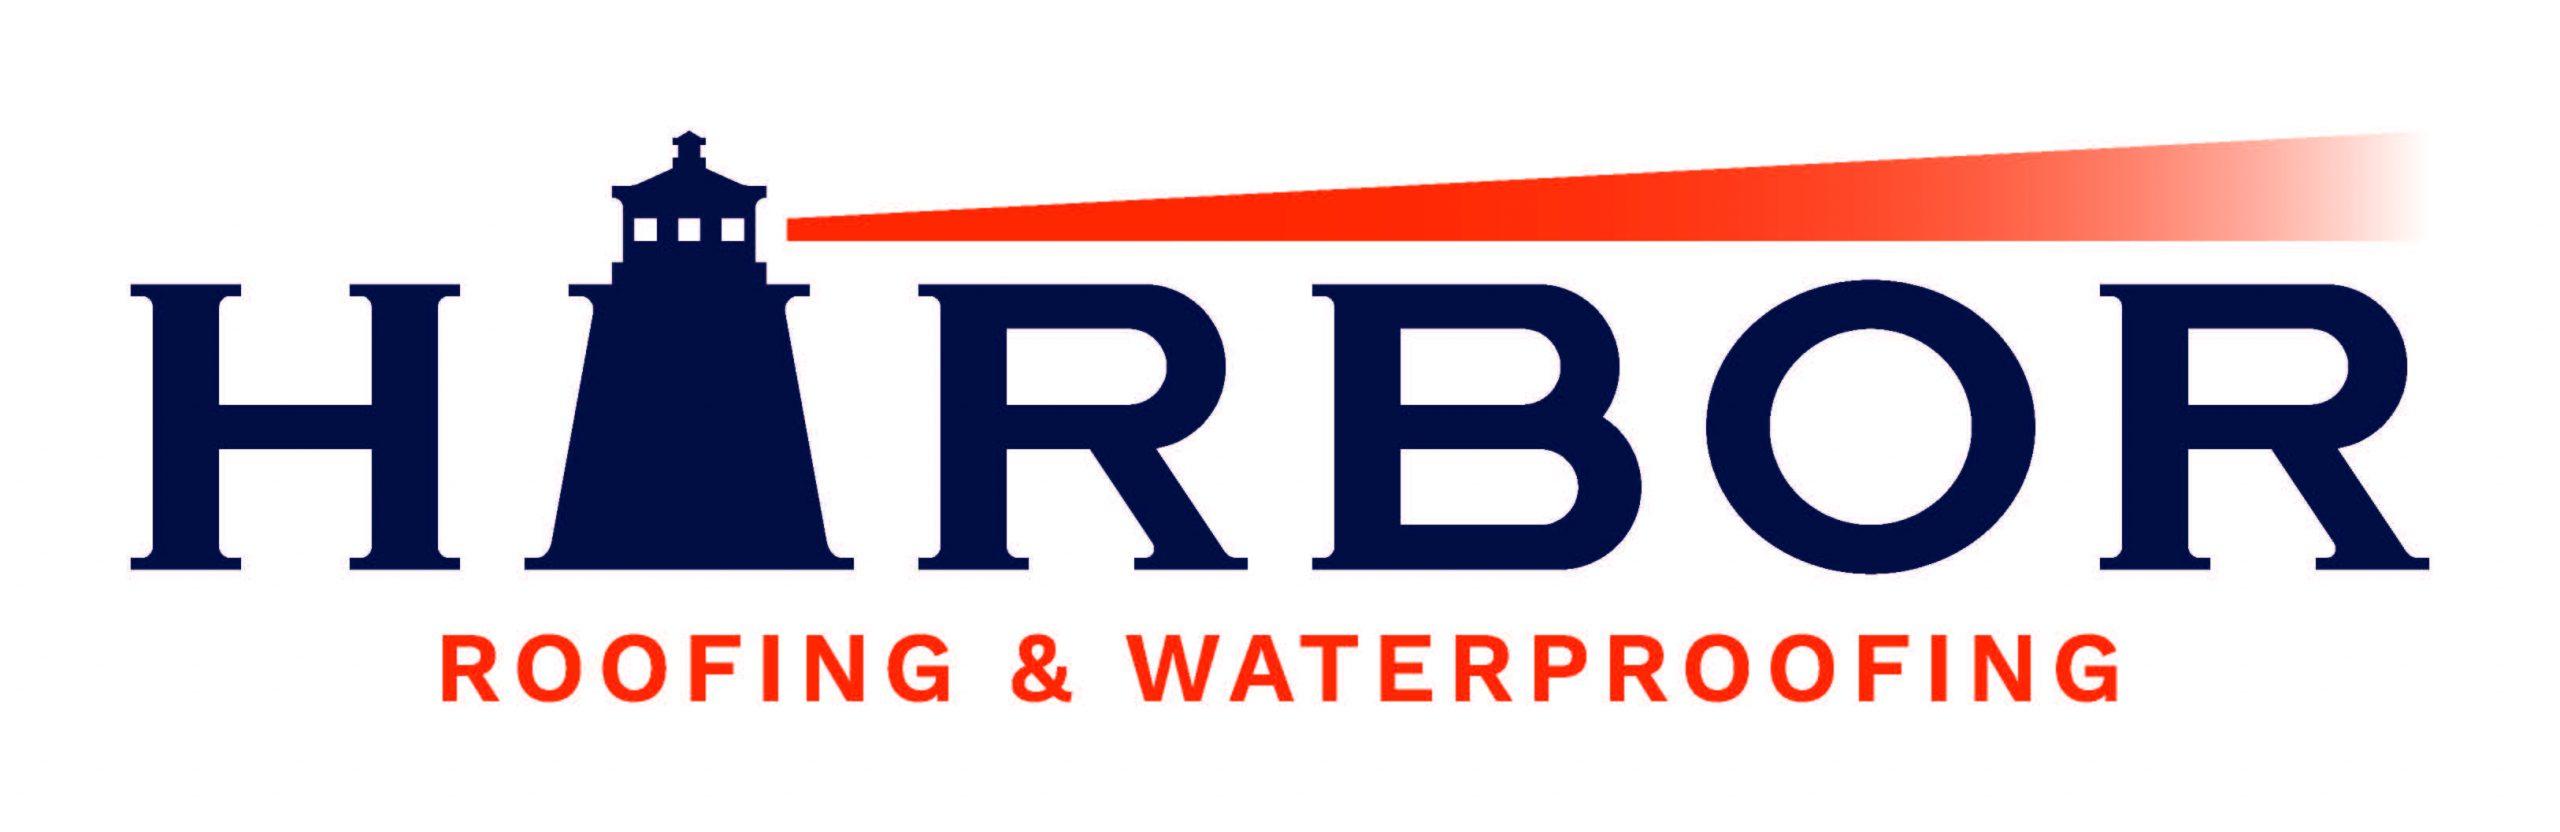 Harbor Roofing and Waterproofing